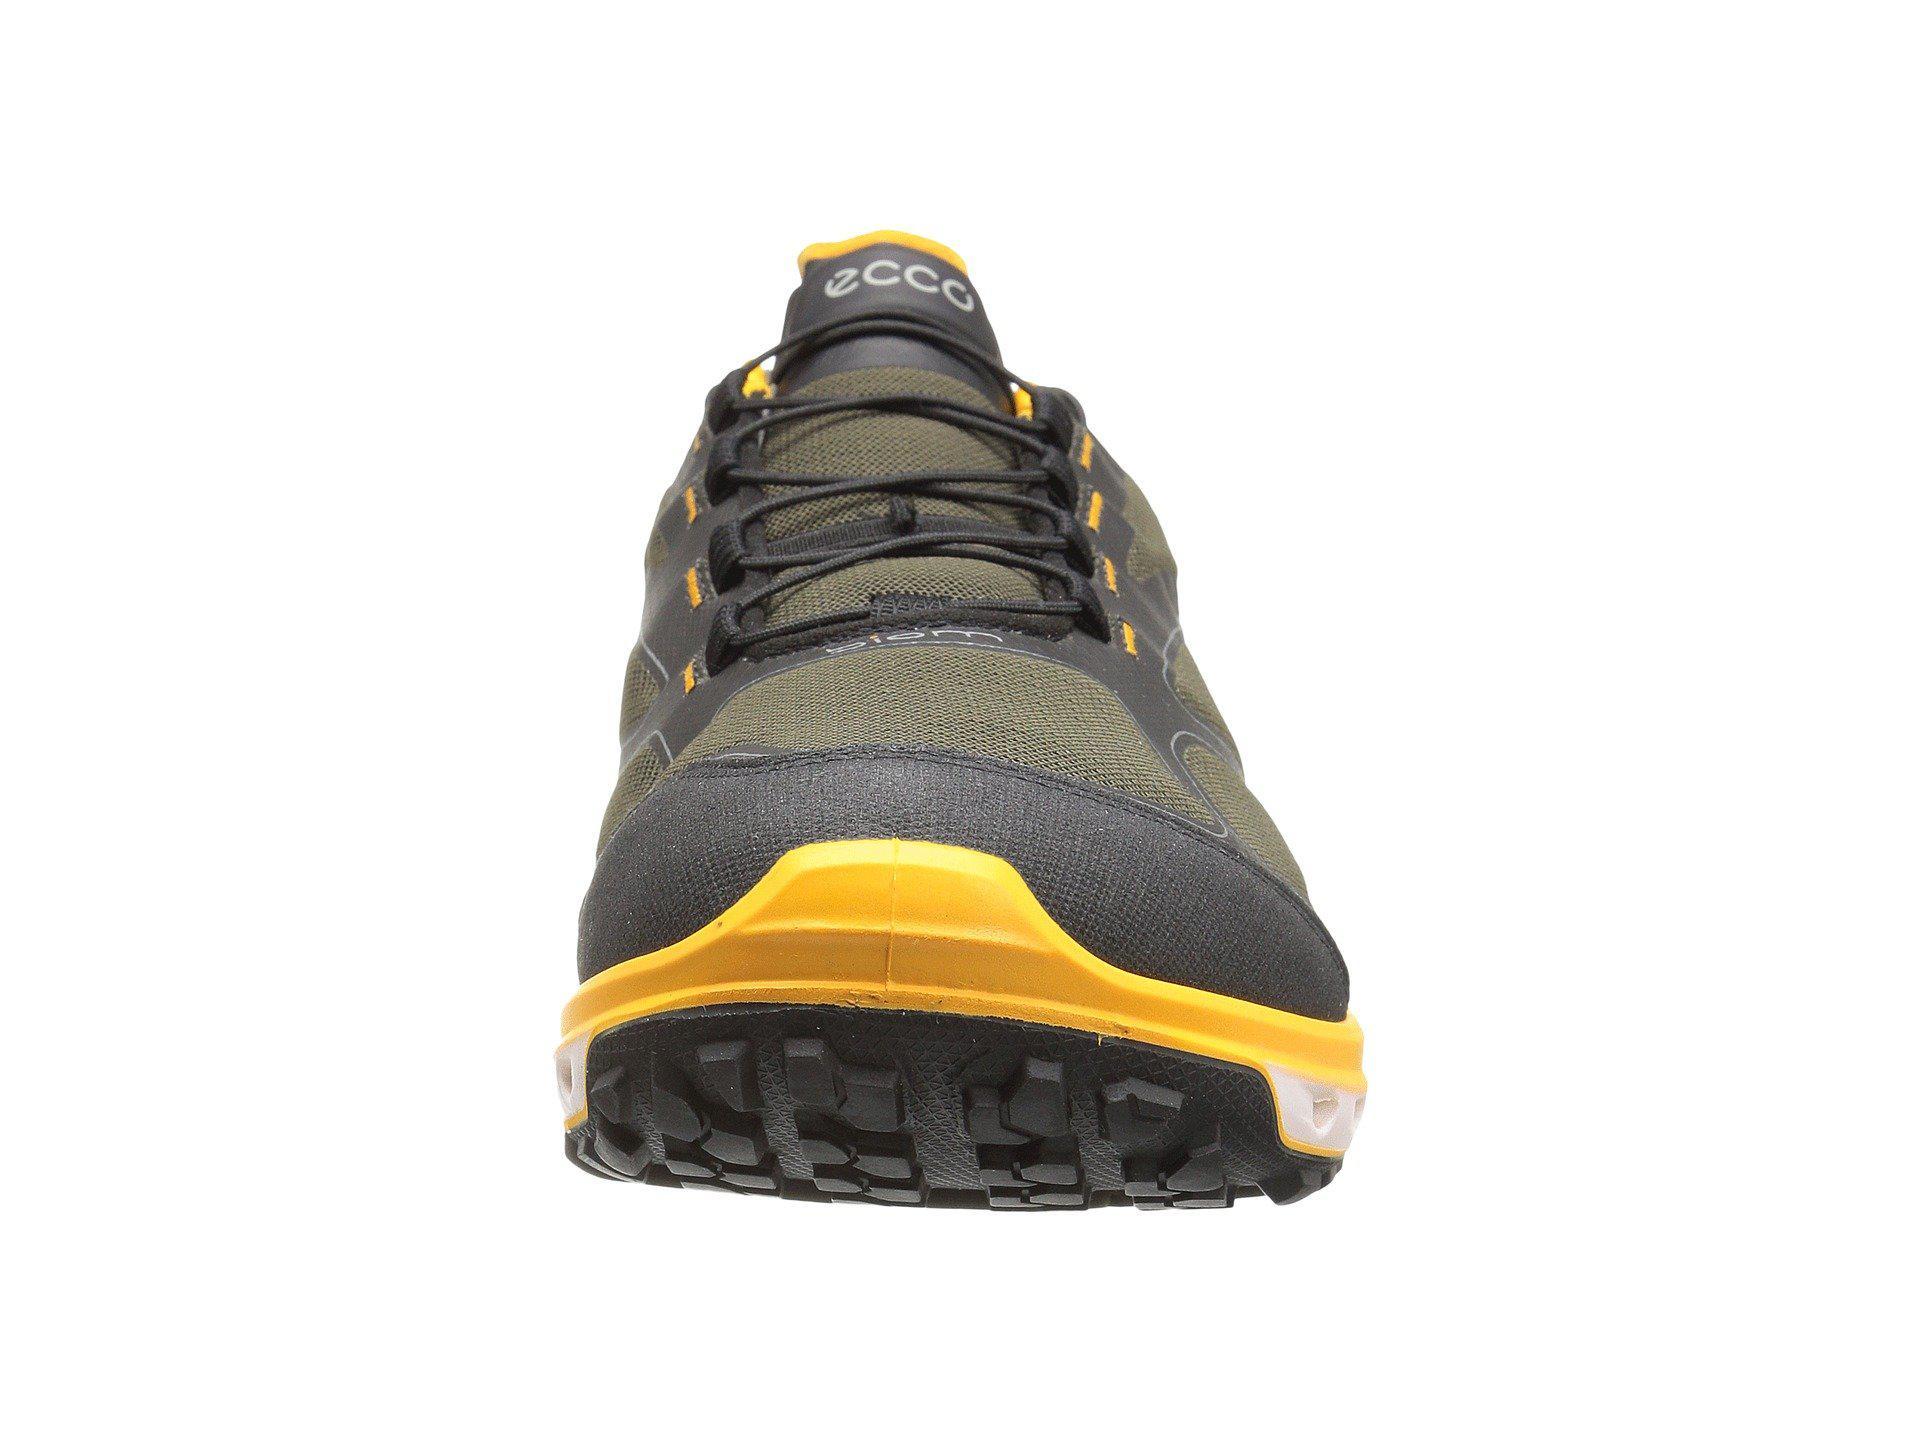 073547c6e2b310 Ecco - Black Biom Venture Gtx for Men - Lyst. View fullscreen